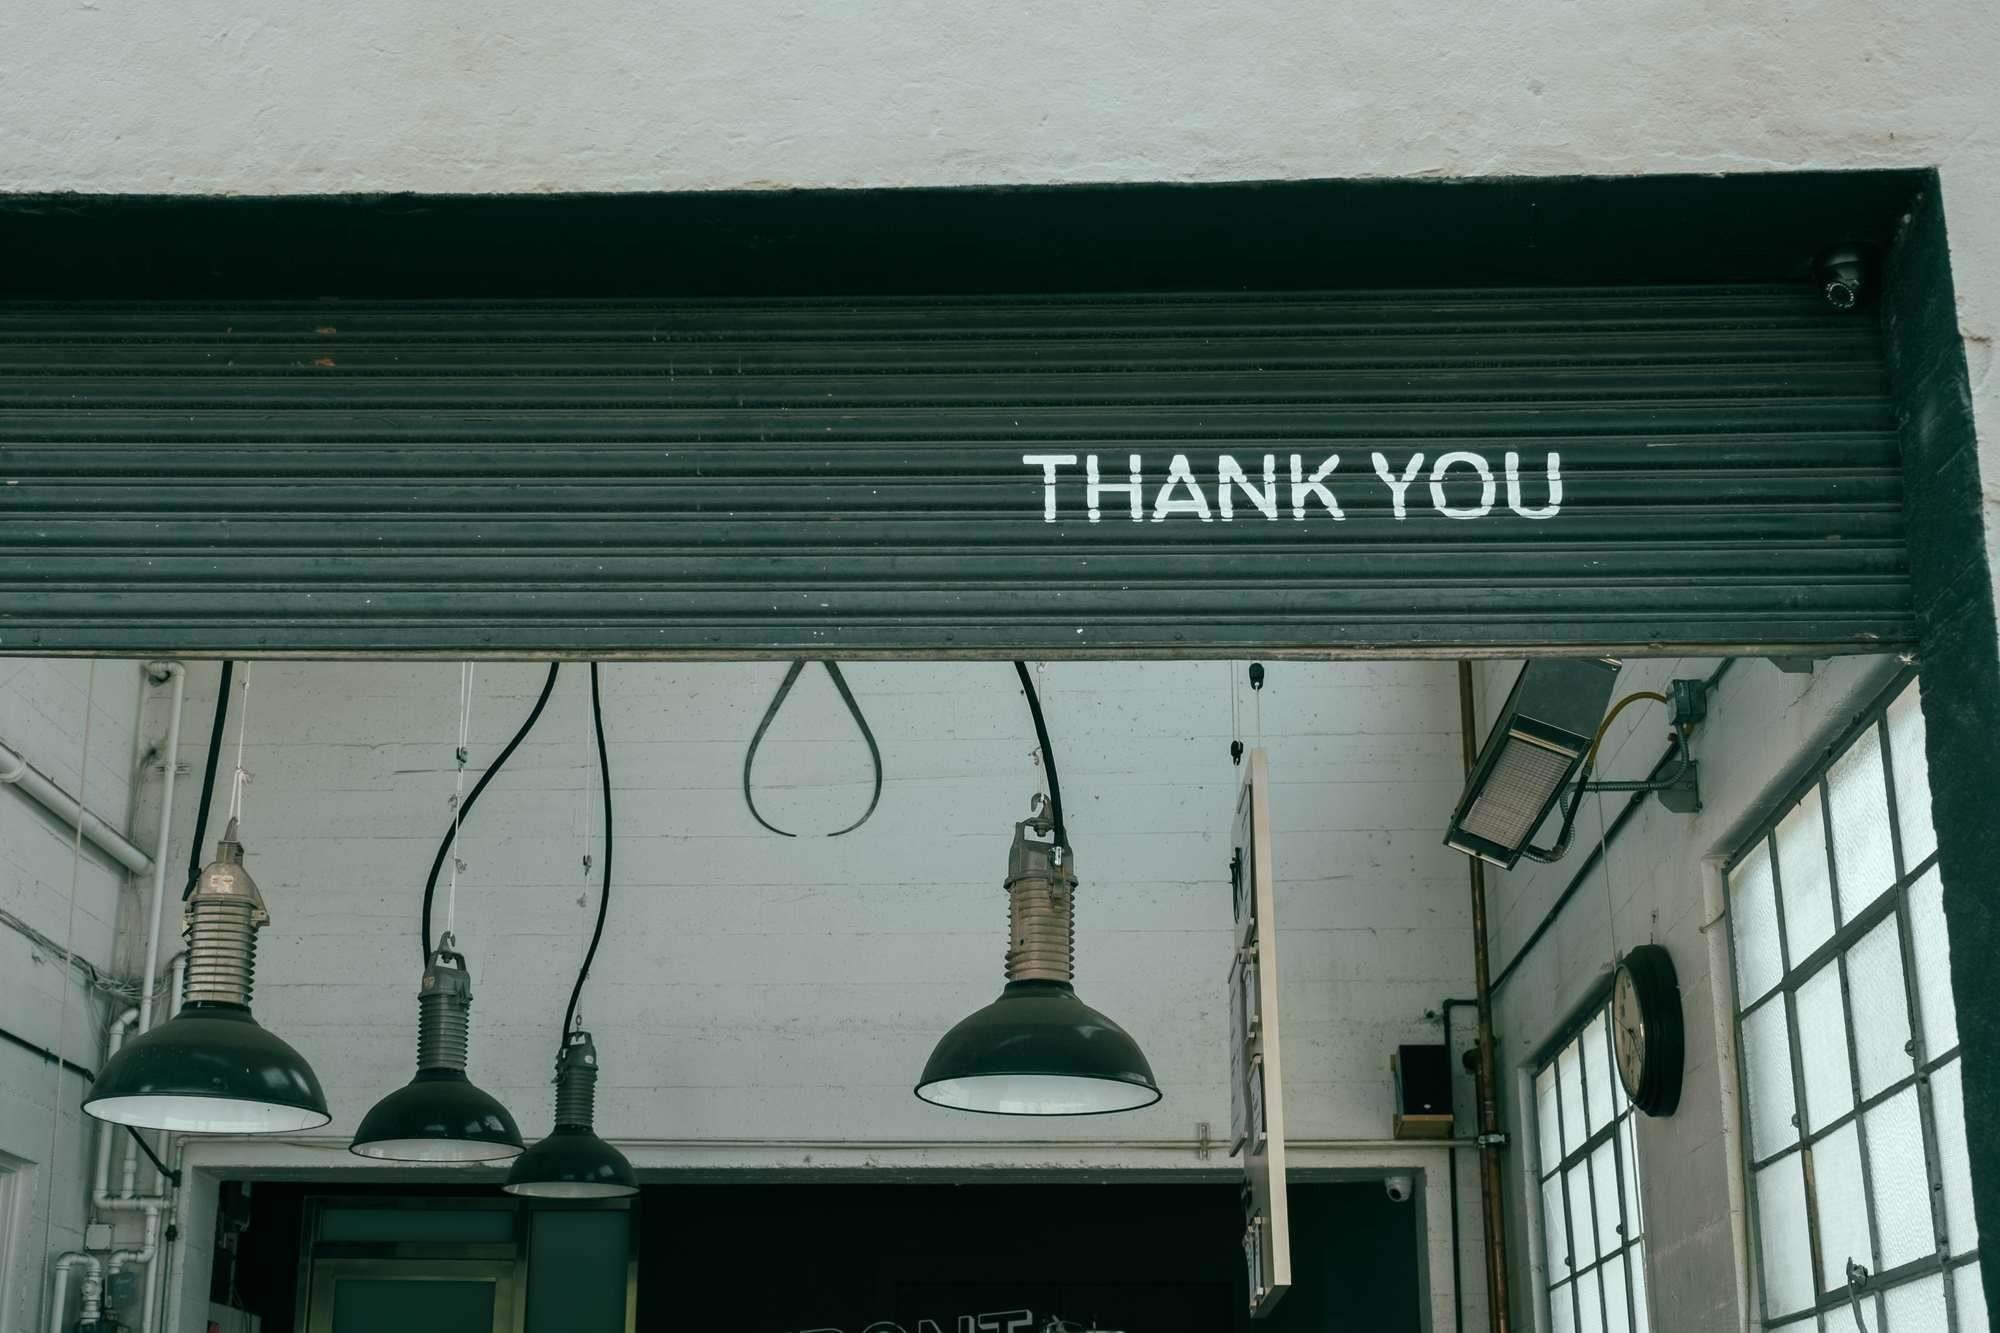 Dankbaar!